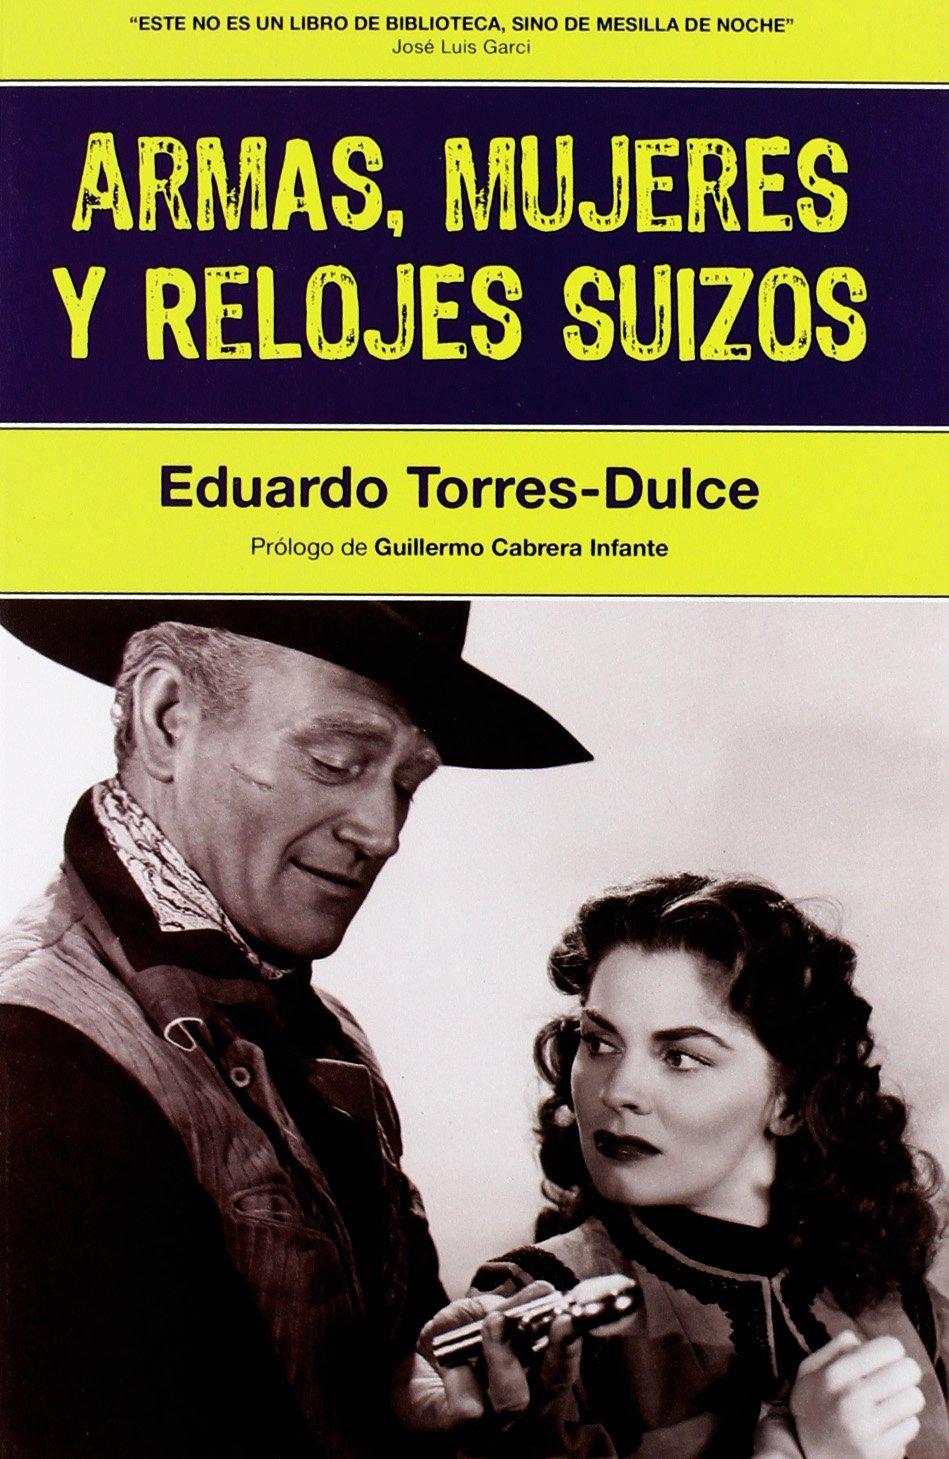 Armas, mujeres y relojes suizos (Spanish) Paperback – March 1, 2010